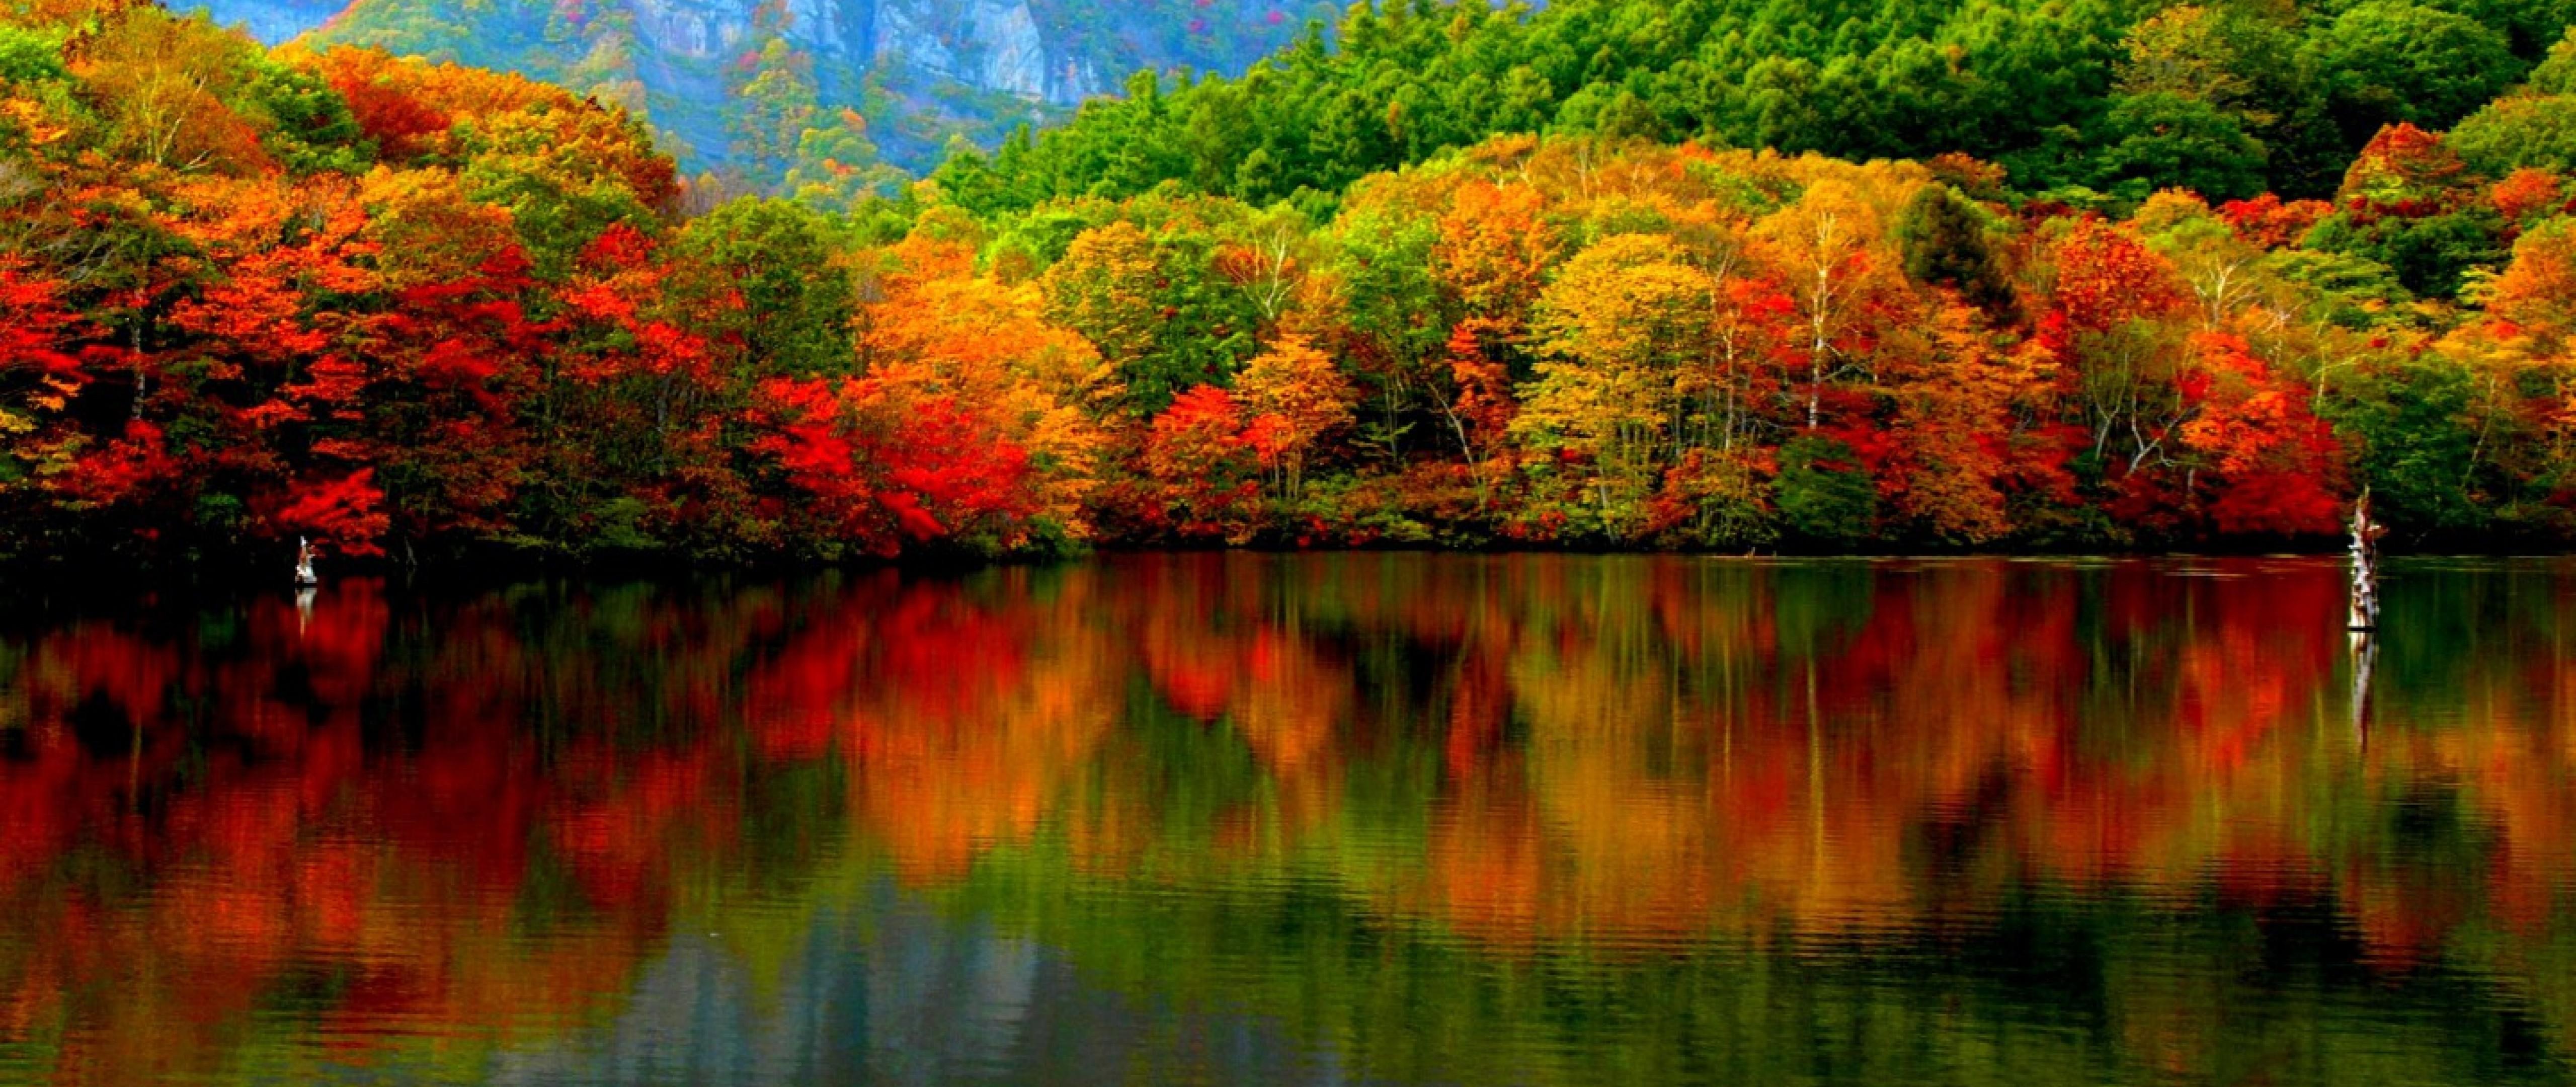 Mountain Autumn Hd Wallpaper 4k Ultra Hd Wide Tv Hd Wallpaper Wallpapers Net